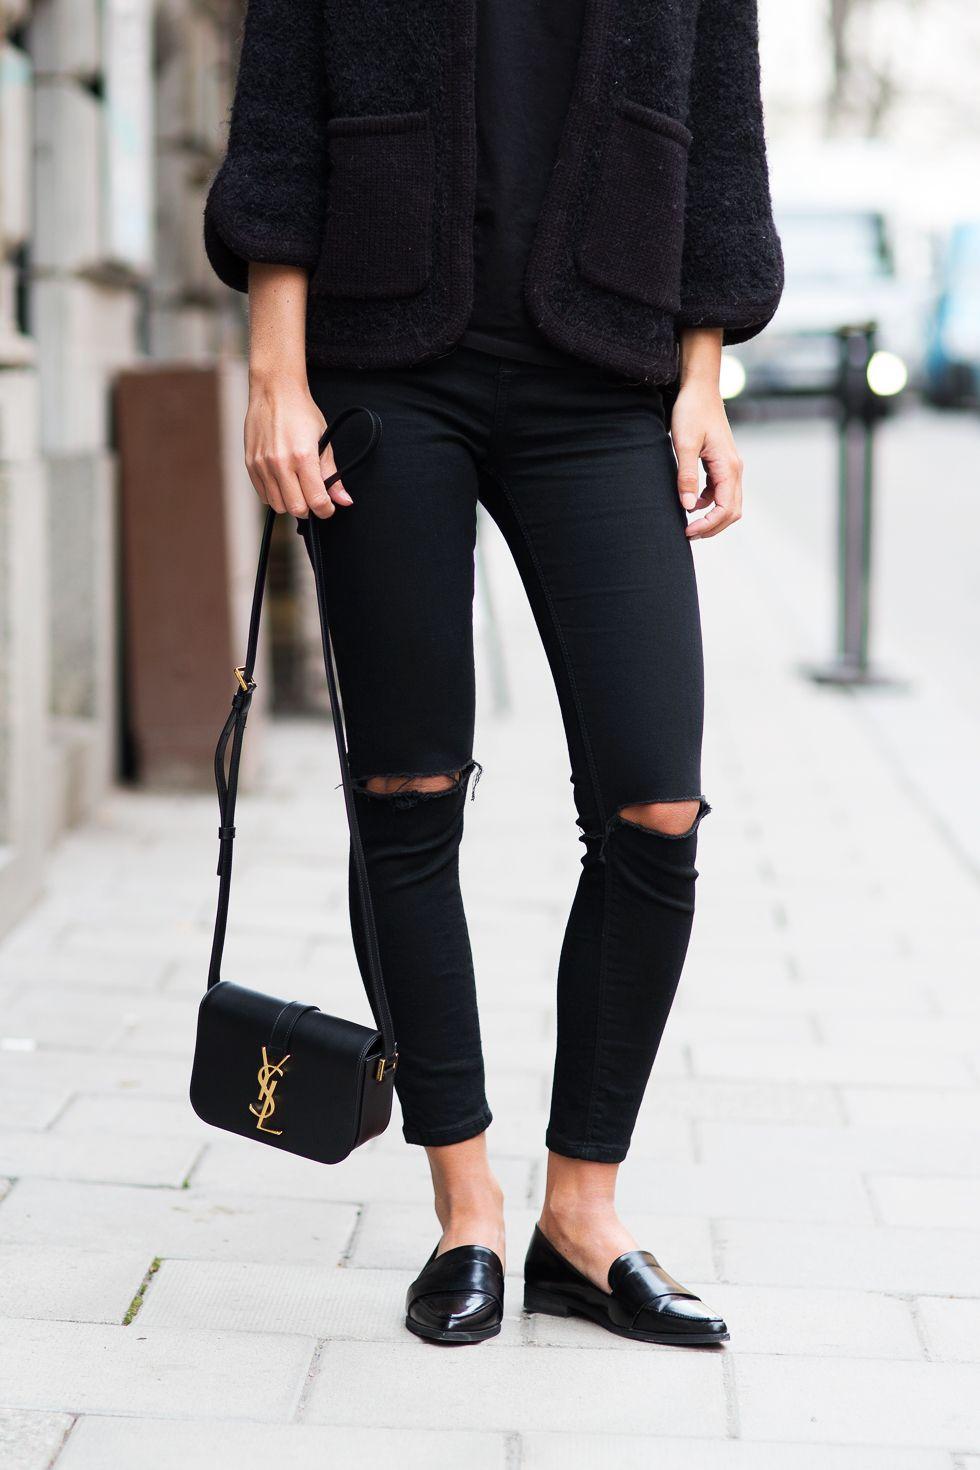 Fashion week Dress black outfits tumblr for girls